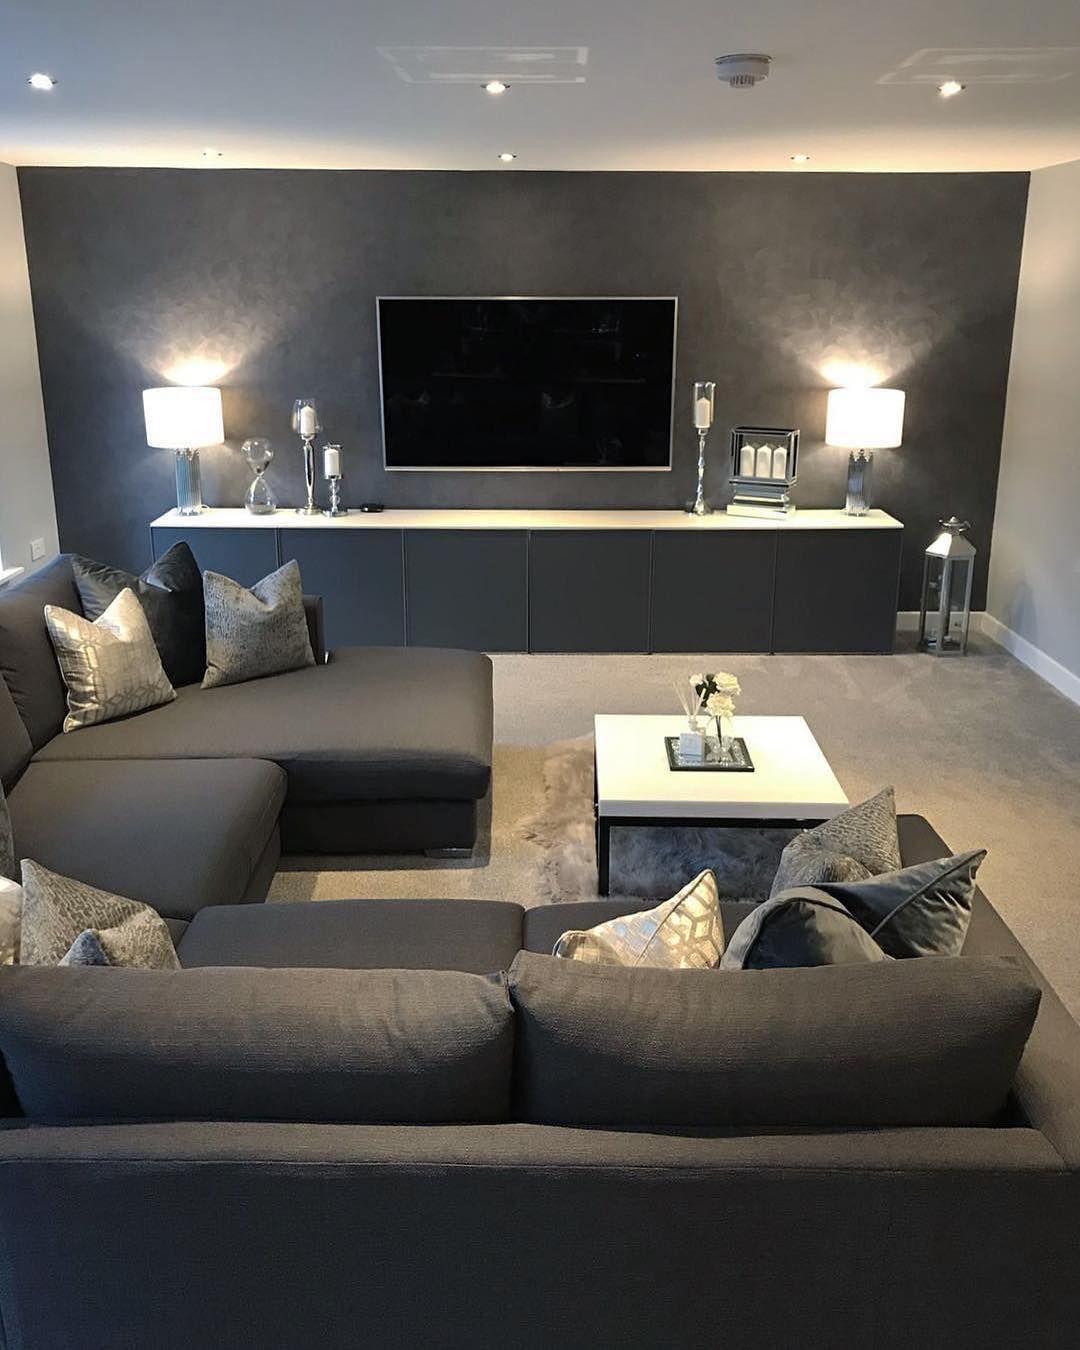 New The 10 Best Interior Designs In The World Interieur De